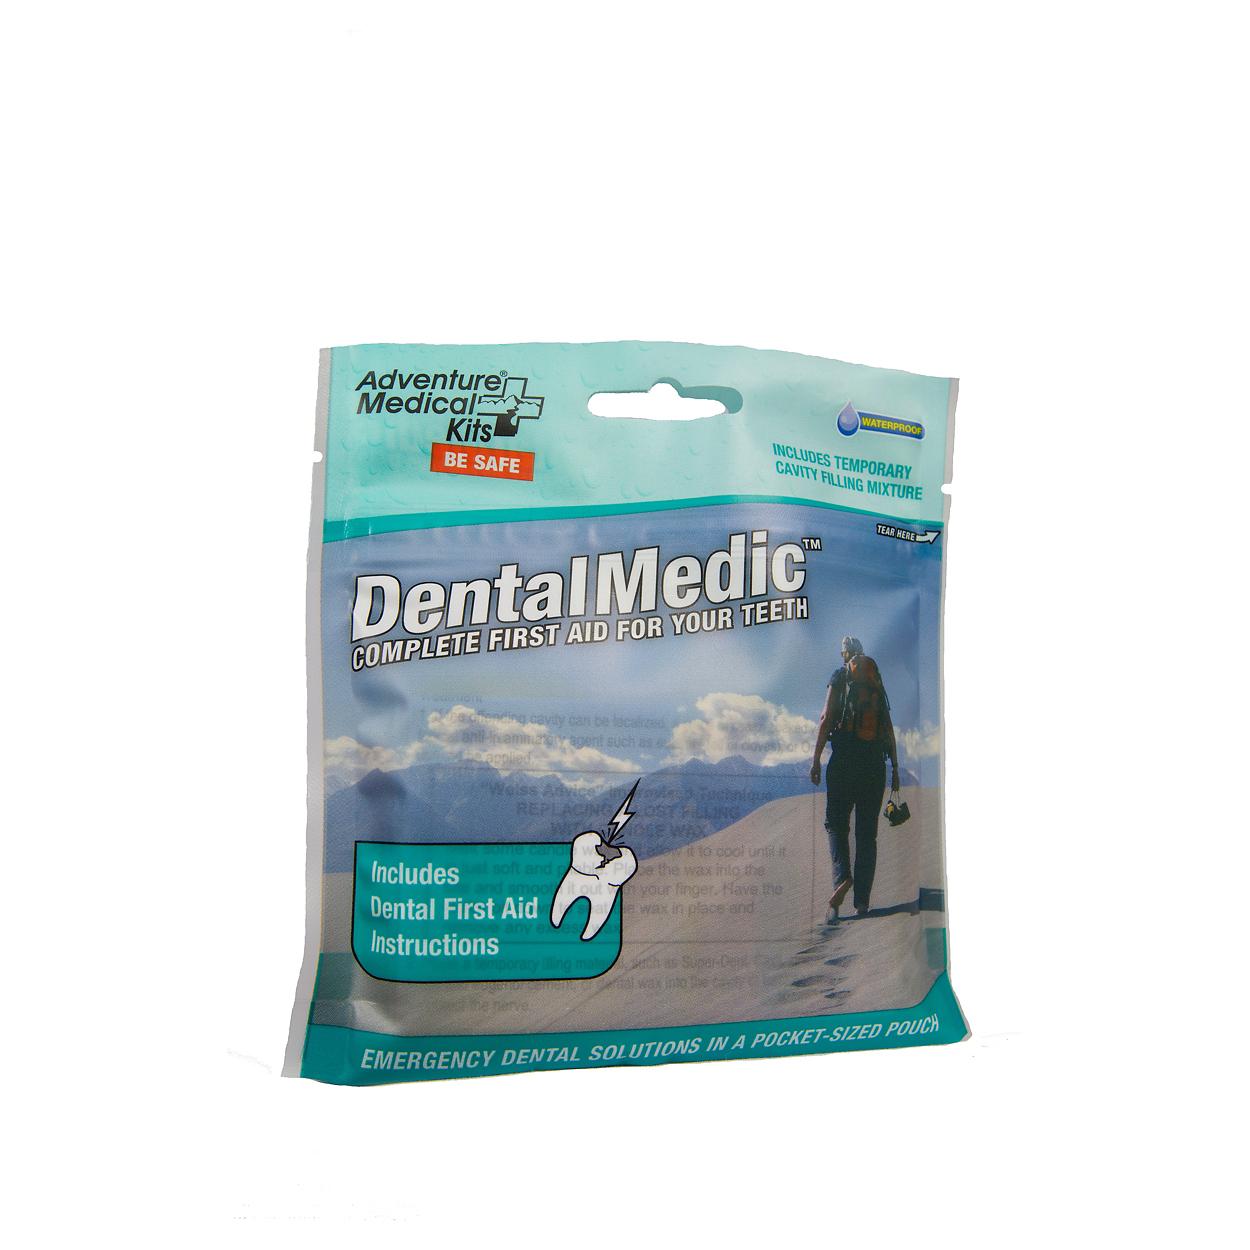 Image of Dental Medic